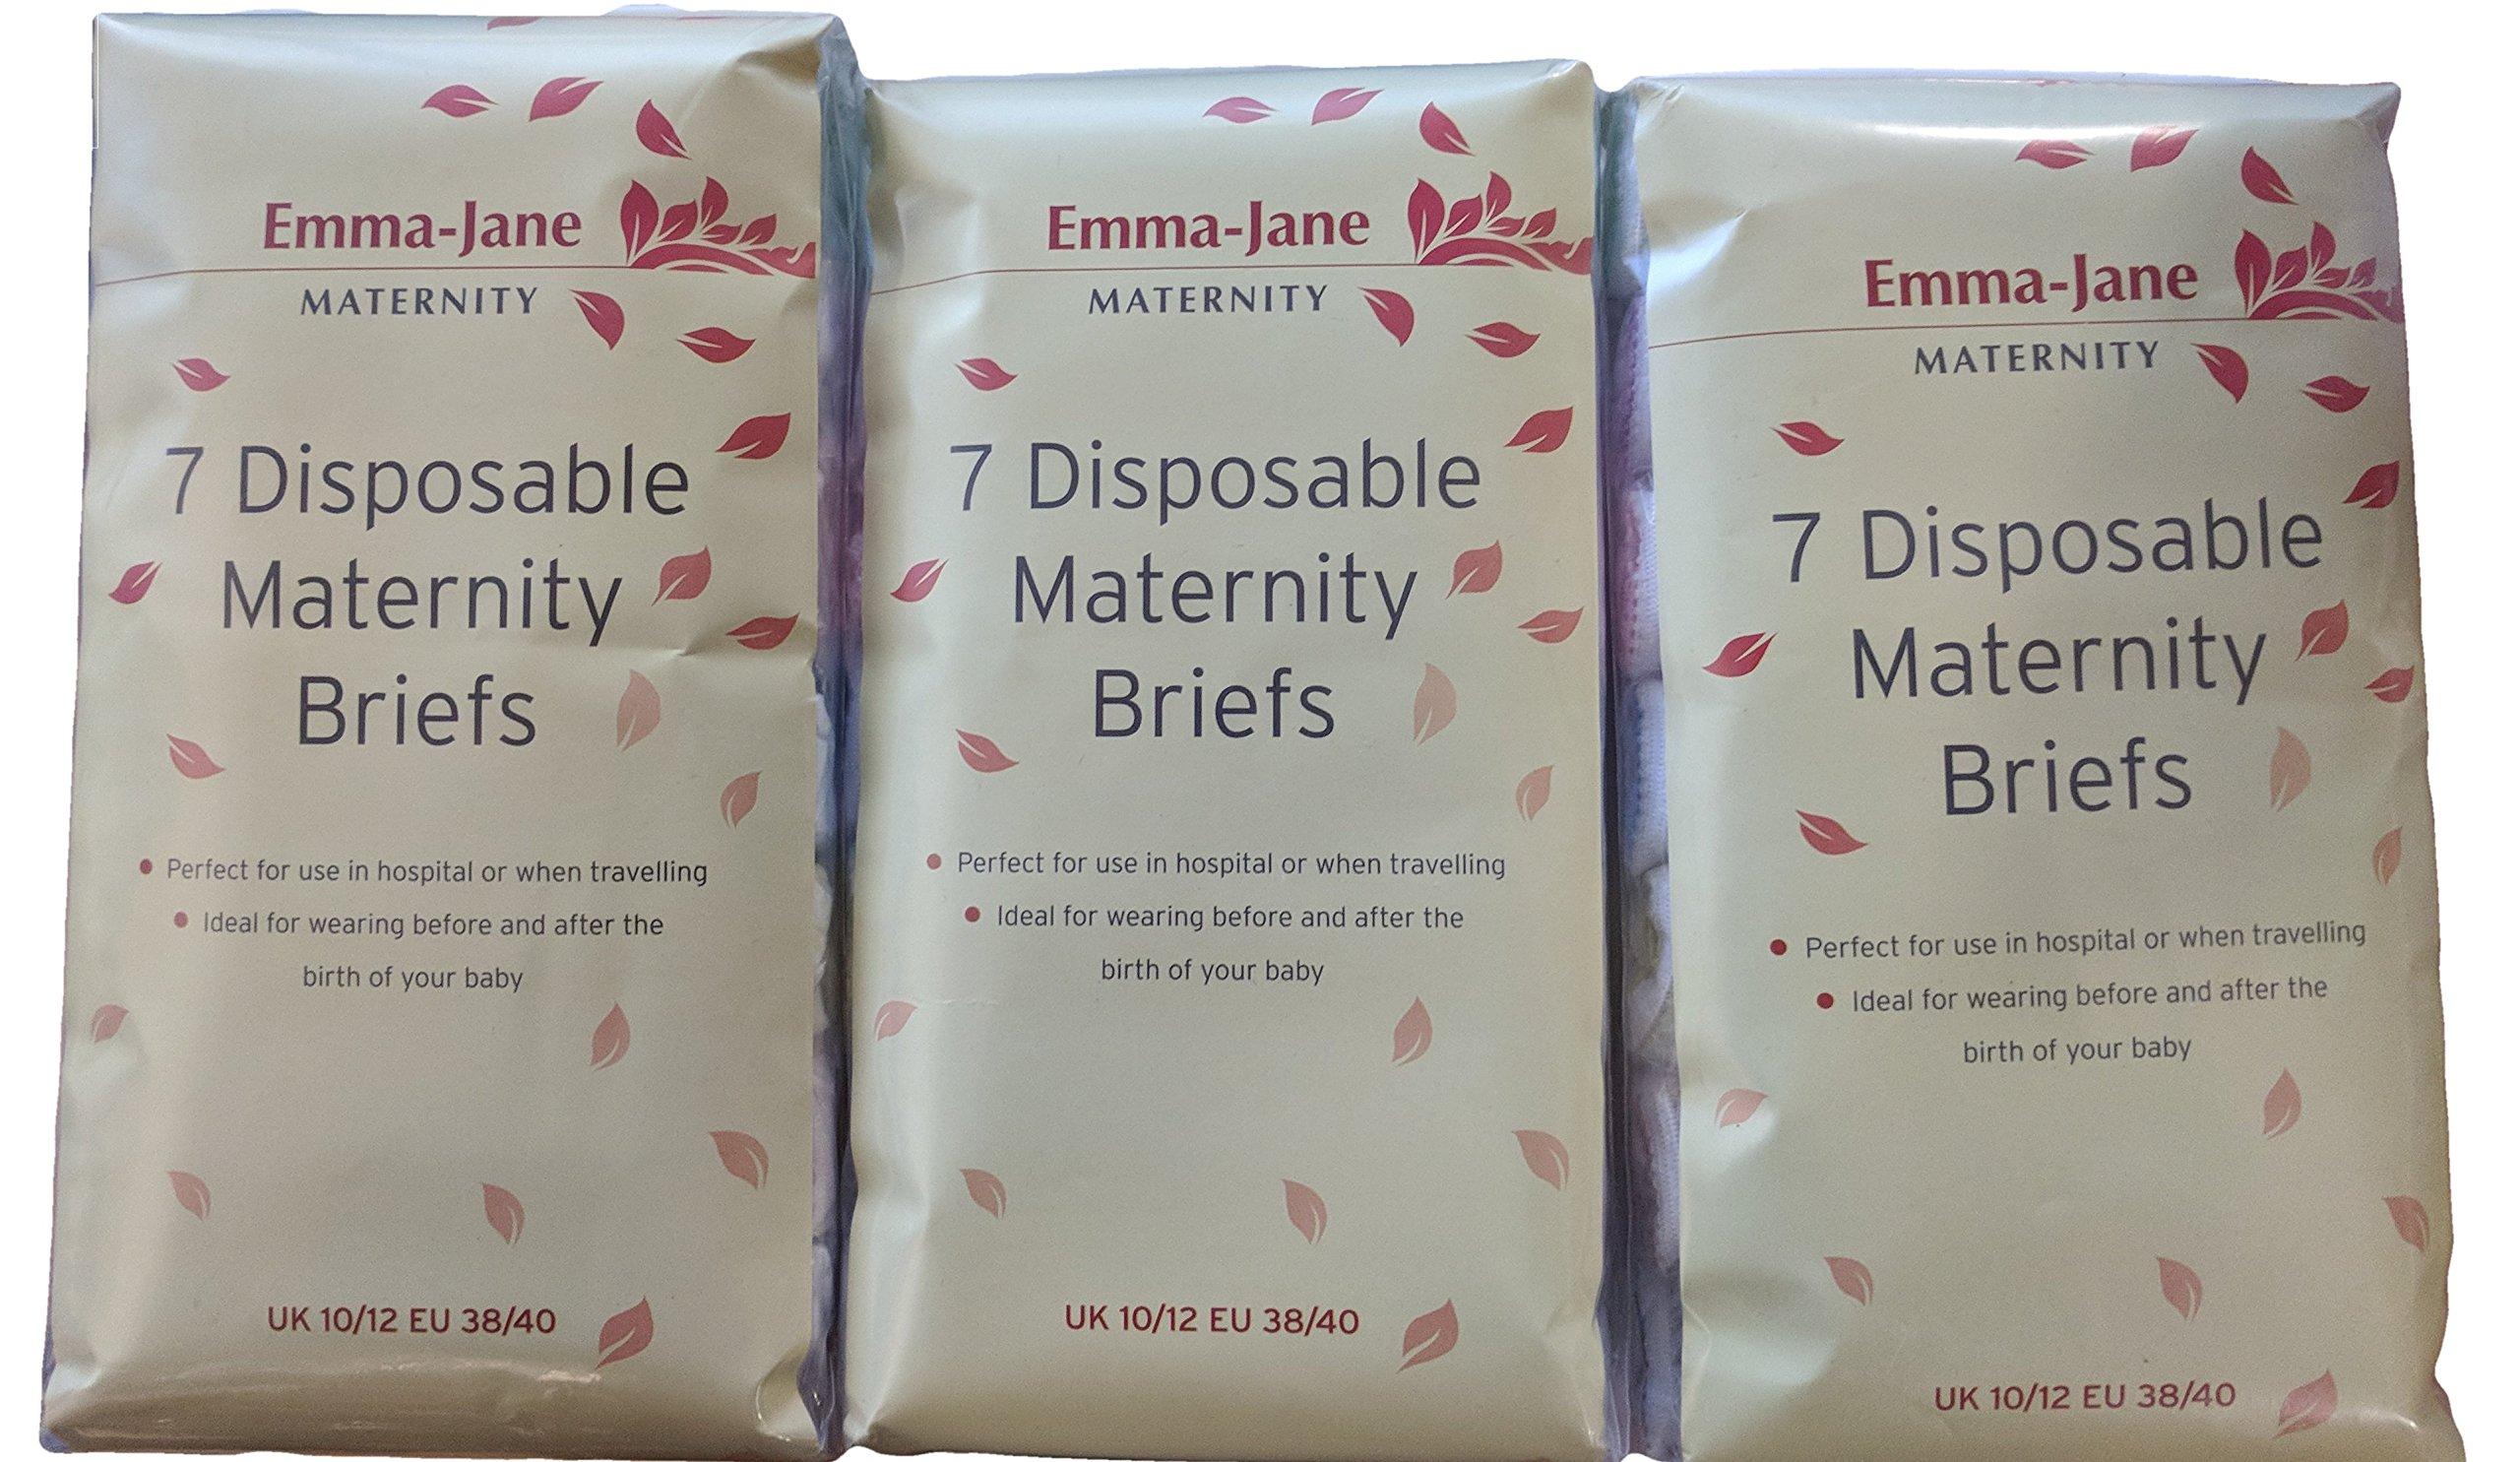 EMMA-JANE MATERNITY BRIEFS UK 10//12 EU 38//40